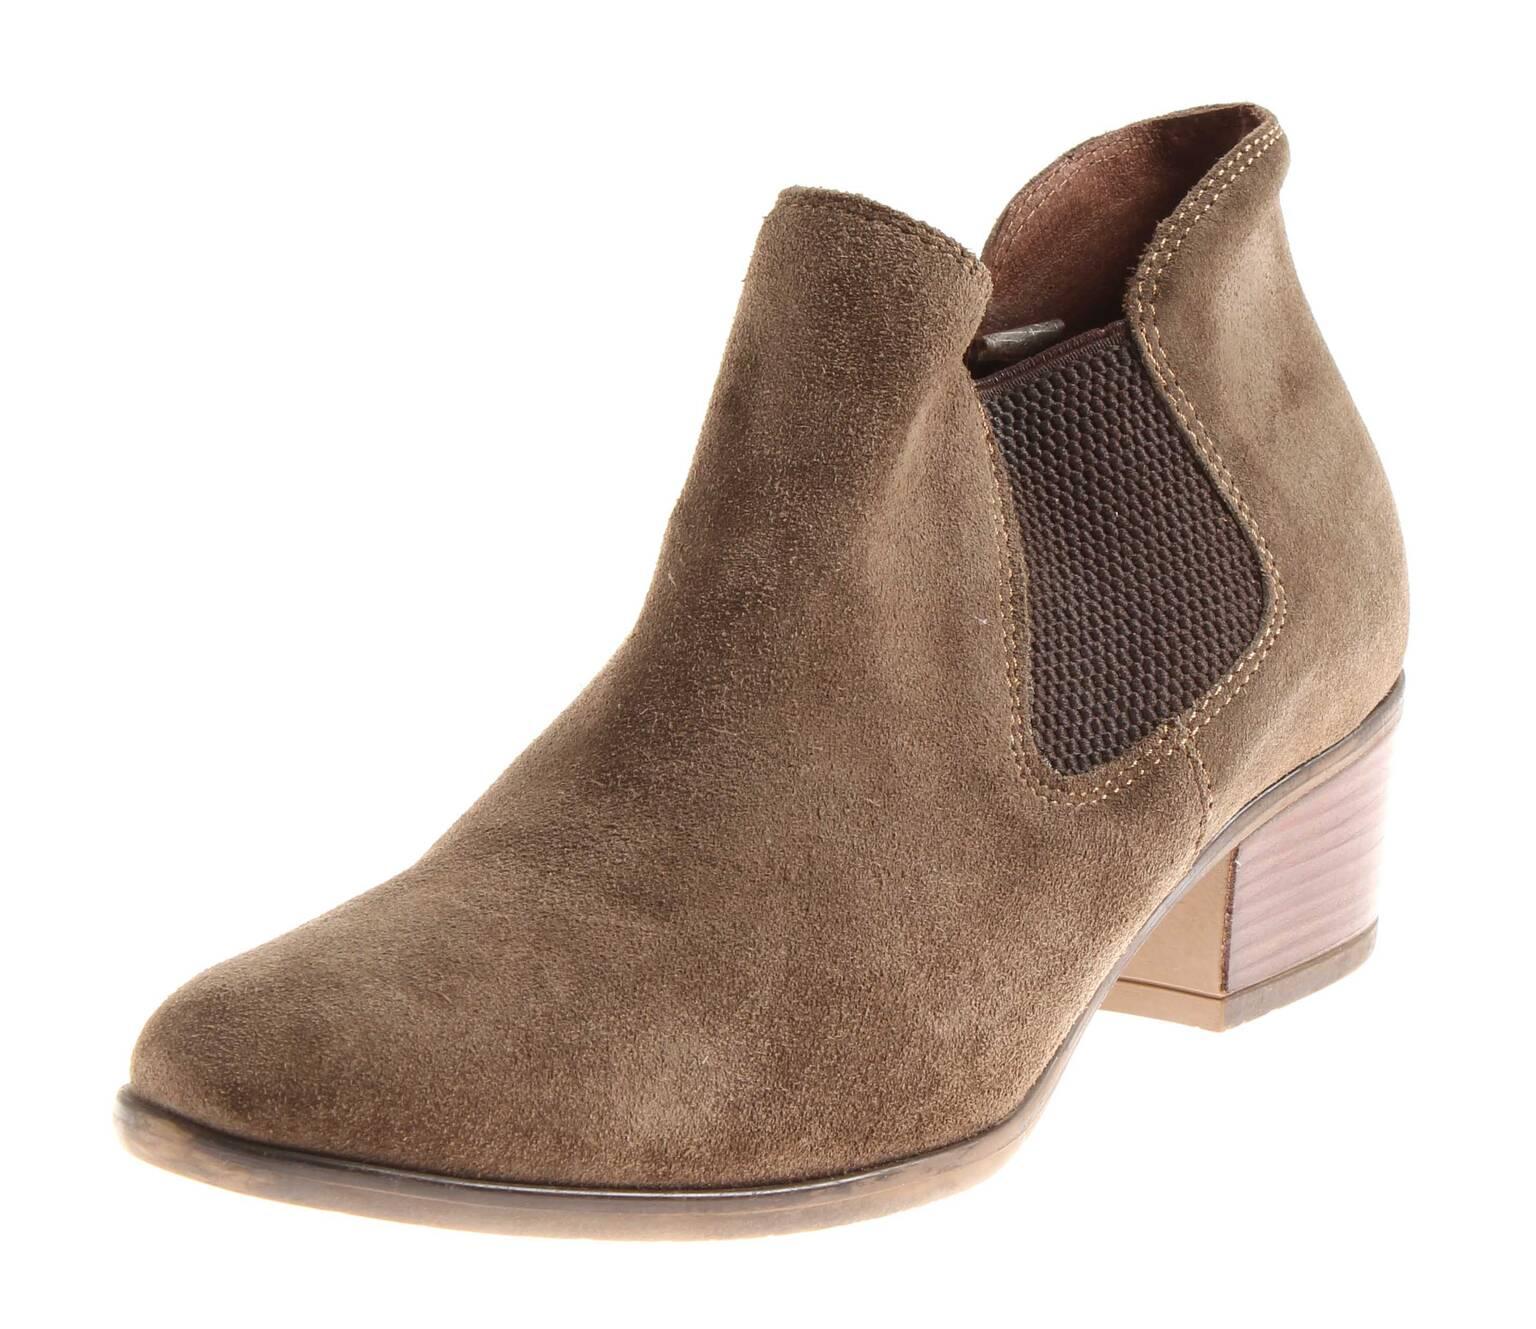 Isabelle Damenschuhe Lederstiefelette Ankle Boot  Damenschuhe Isabelle Leder Stiefelette Wildleder 0876e8